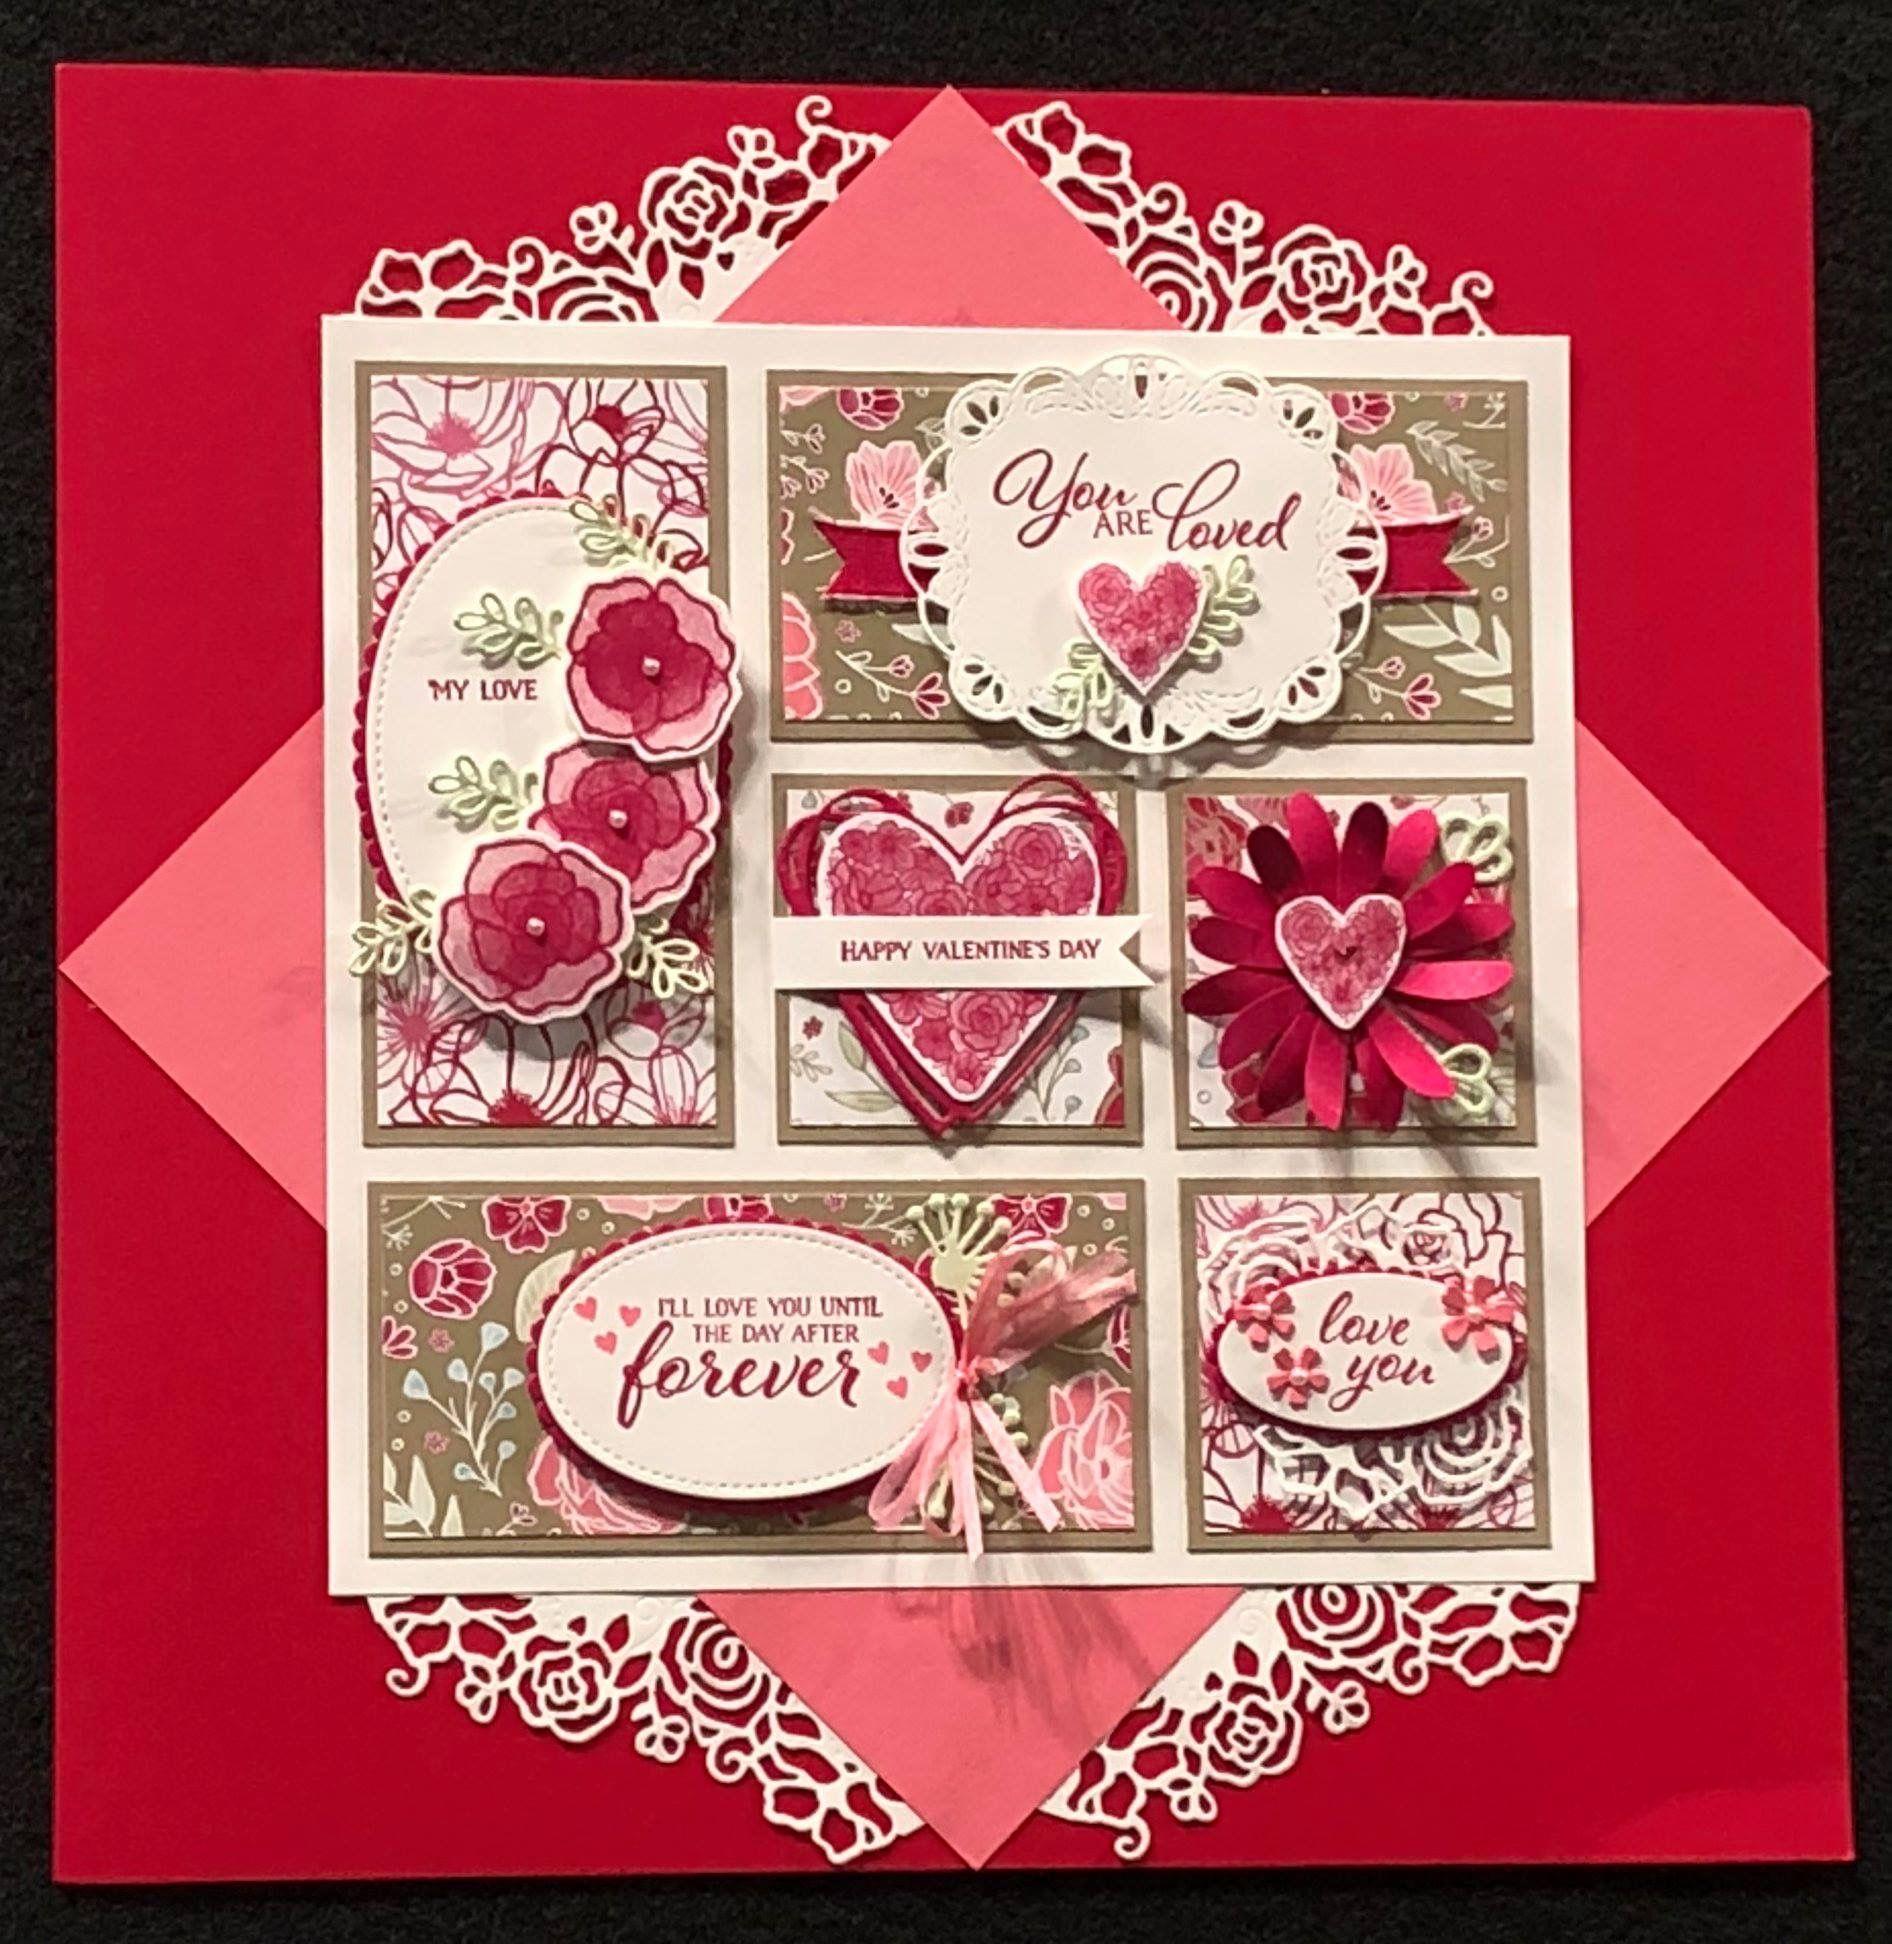 pinjuleen henderson on stampin up sampler  valentine